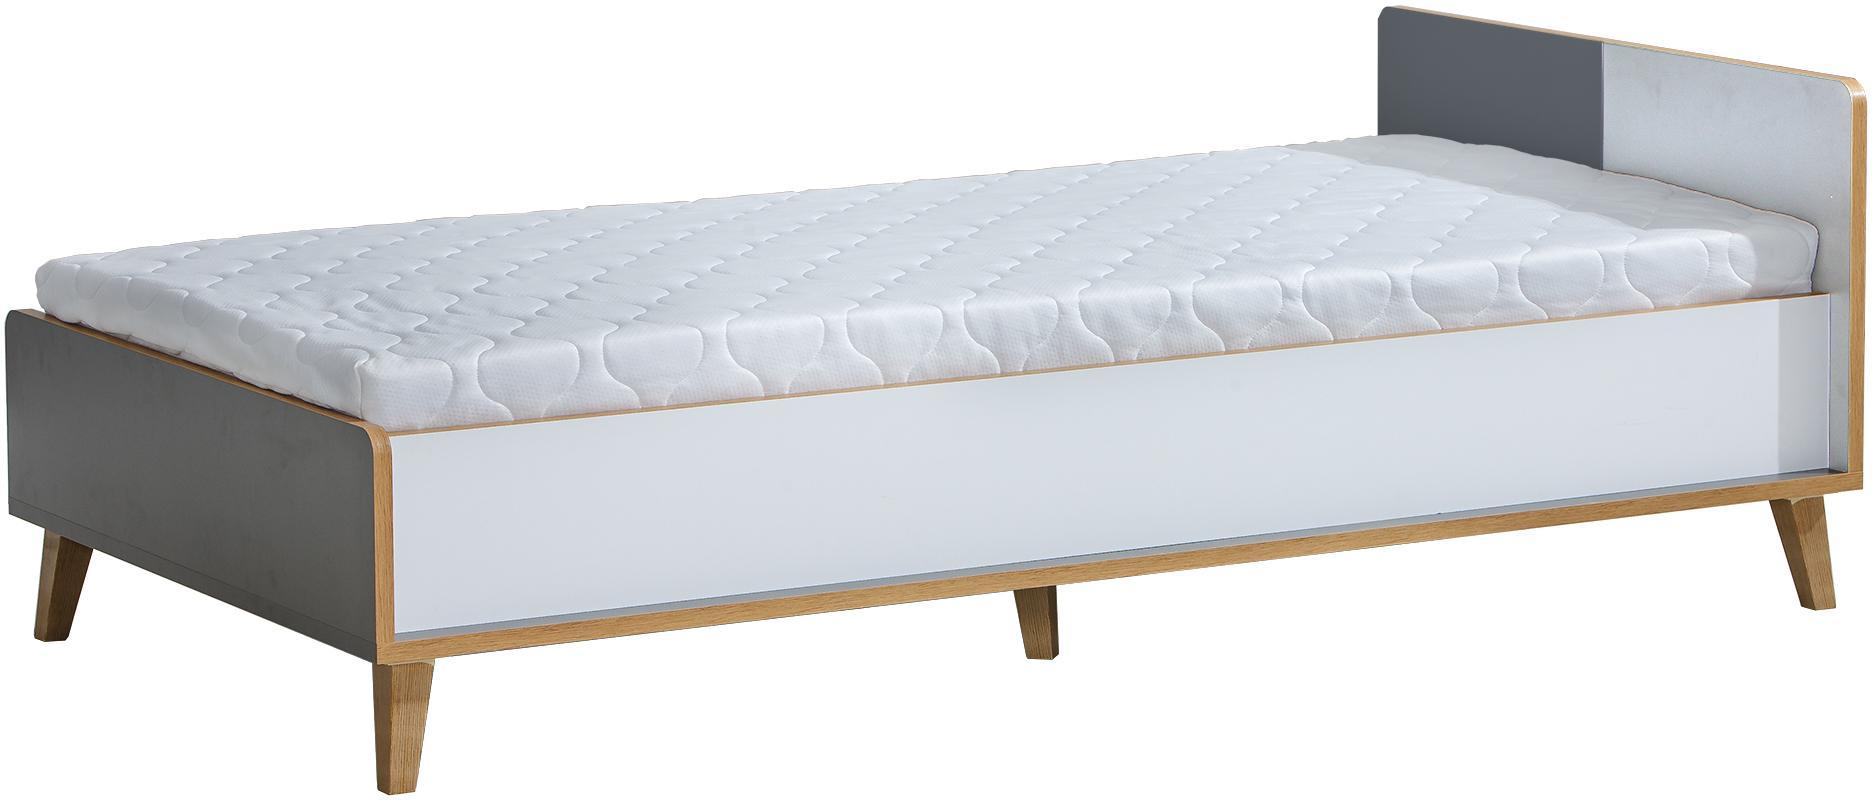 DL Detská posteľ VASAT 10 195x90